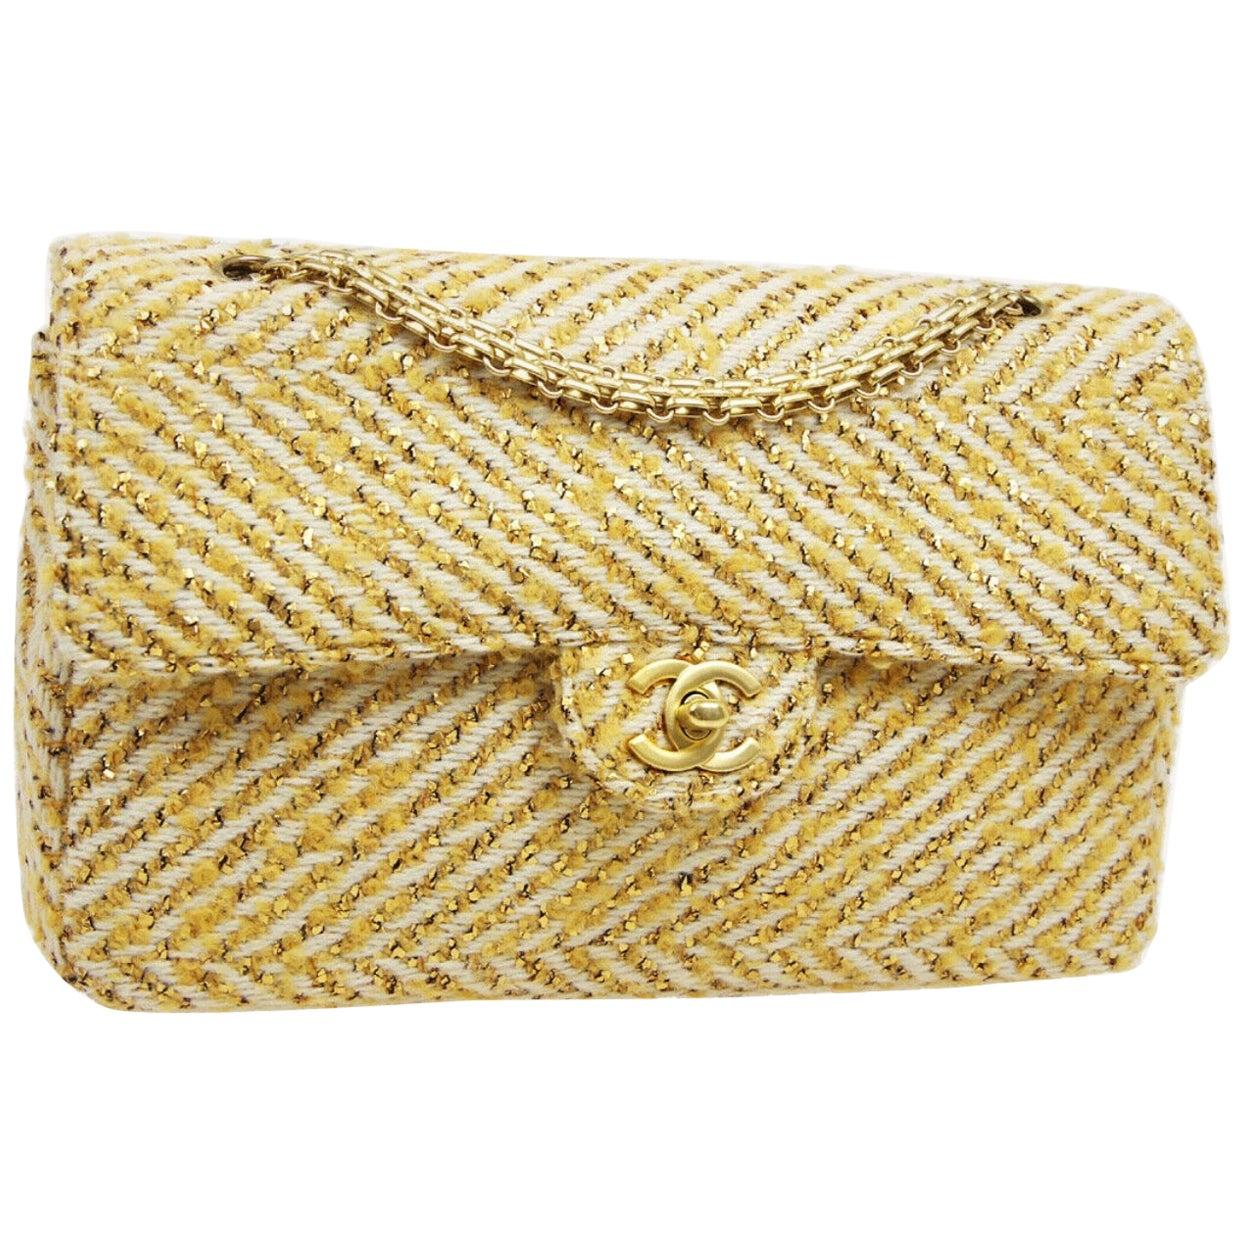 Chanel Yellow Tweed Gold Medium Evening Shoulder Flap Bag in Box